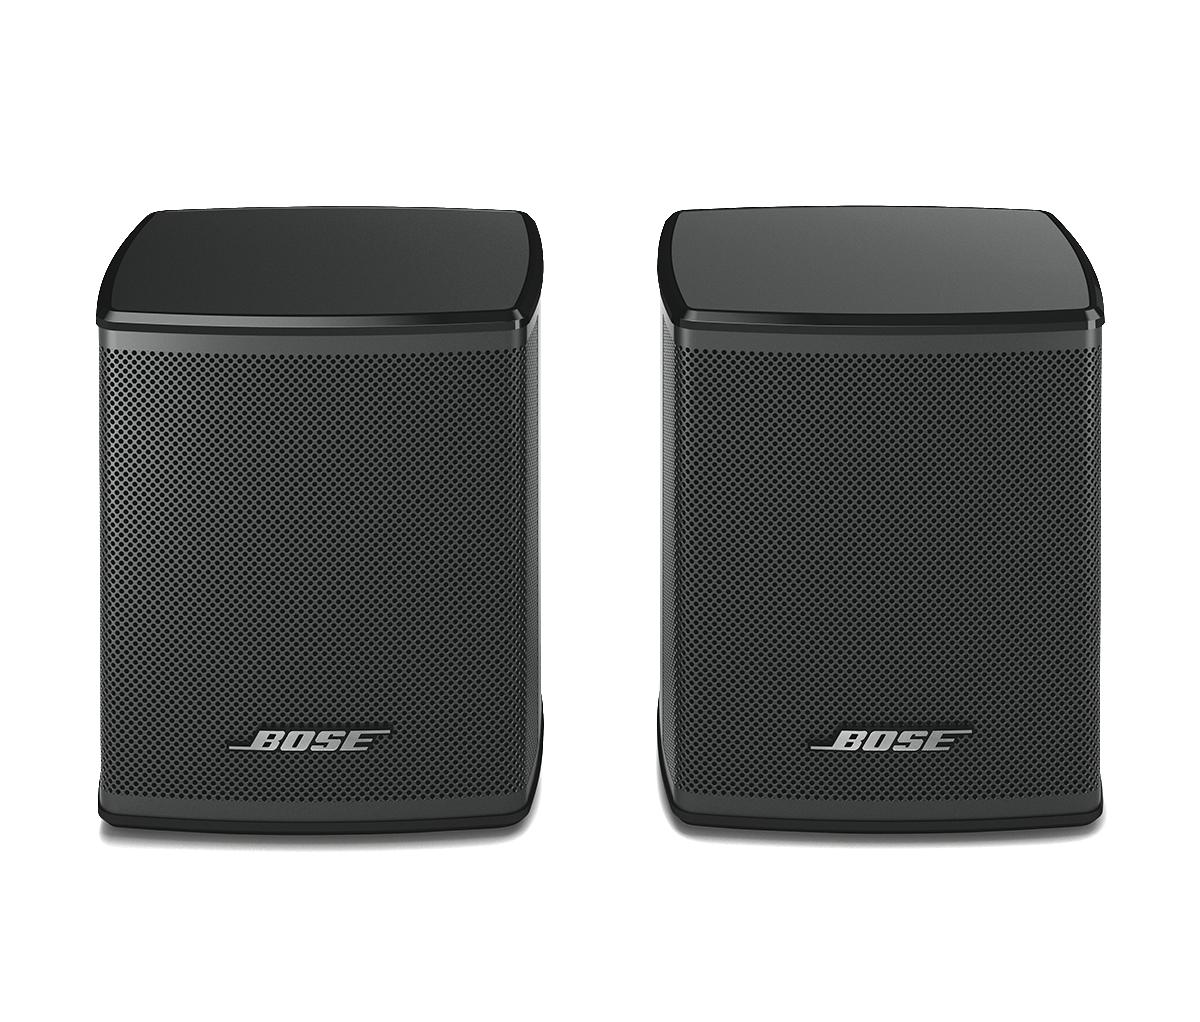 Bose_Surround_Speakers